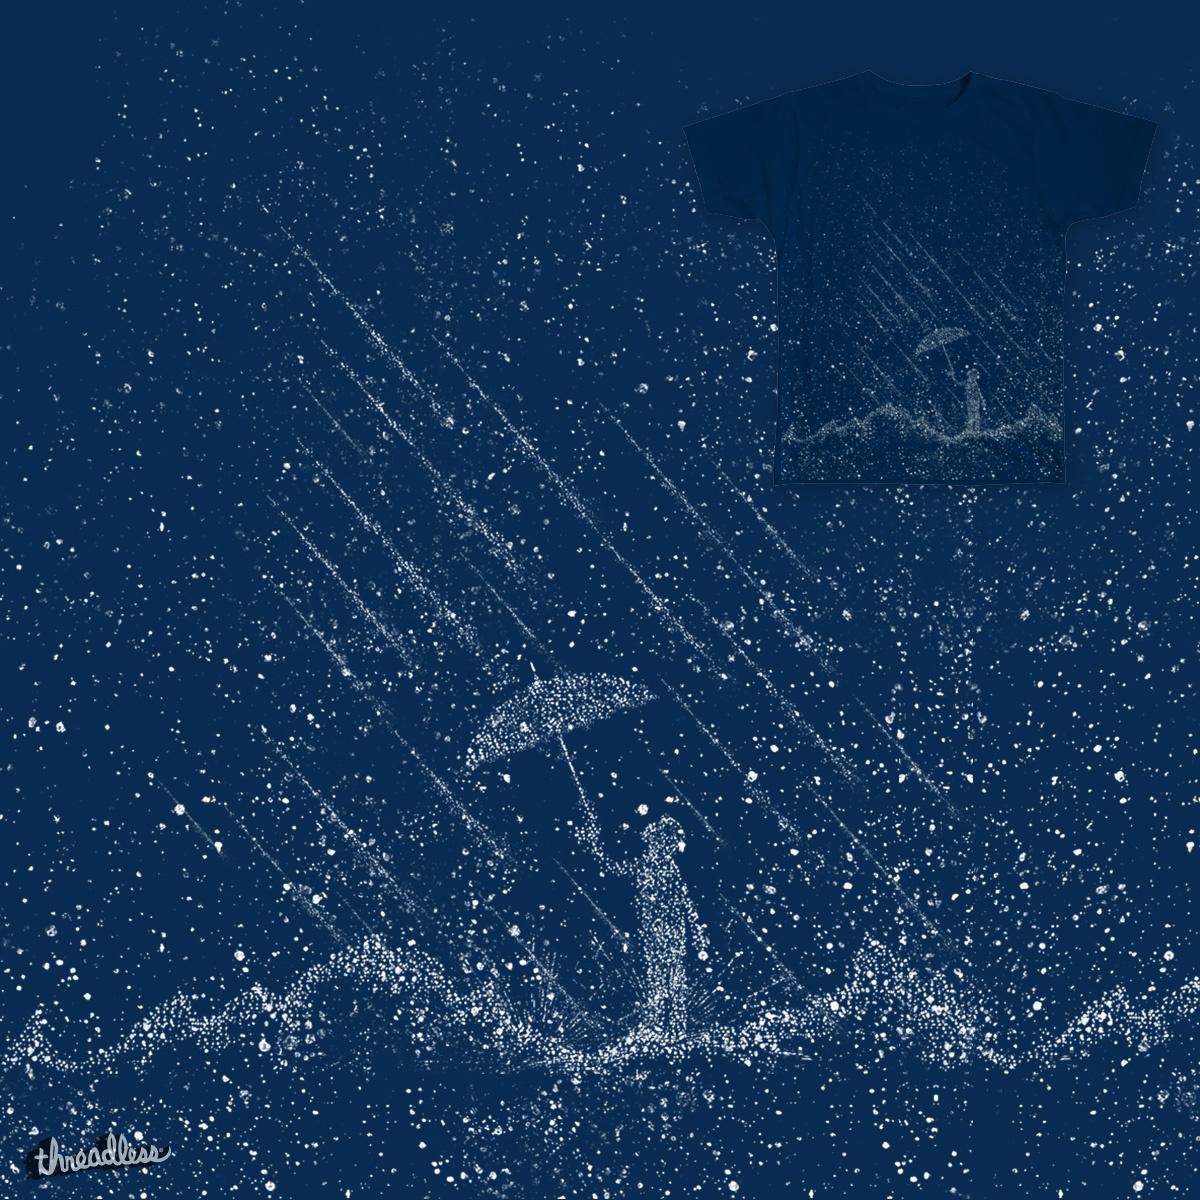 The Rain by xmanson on Threadless